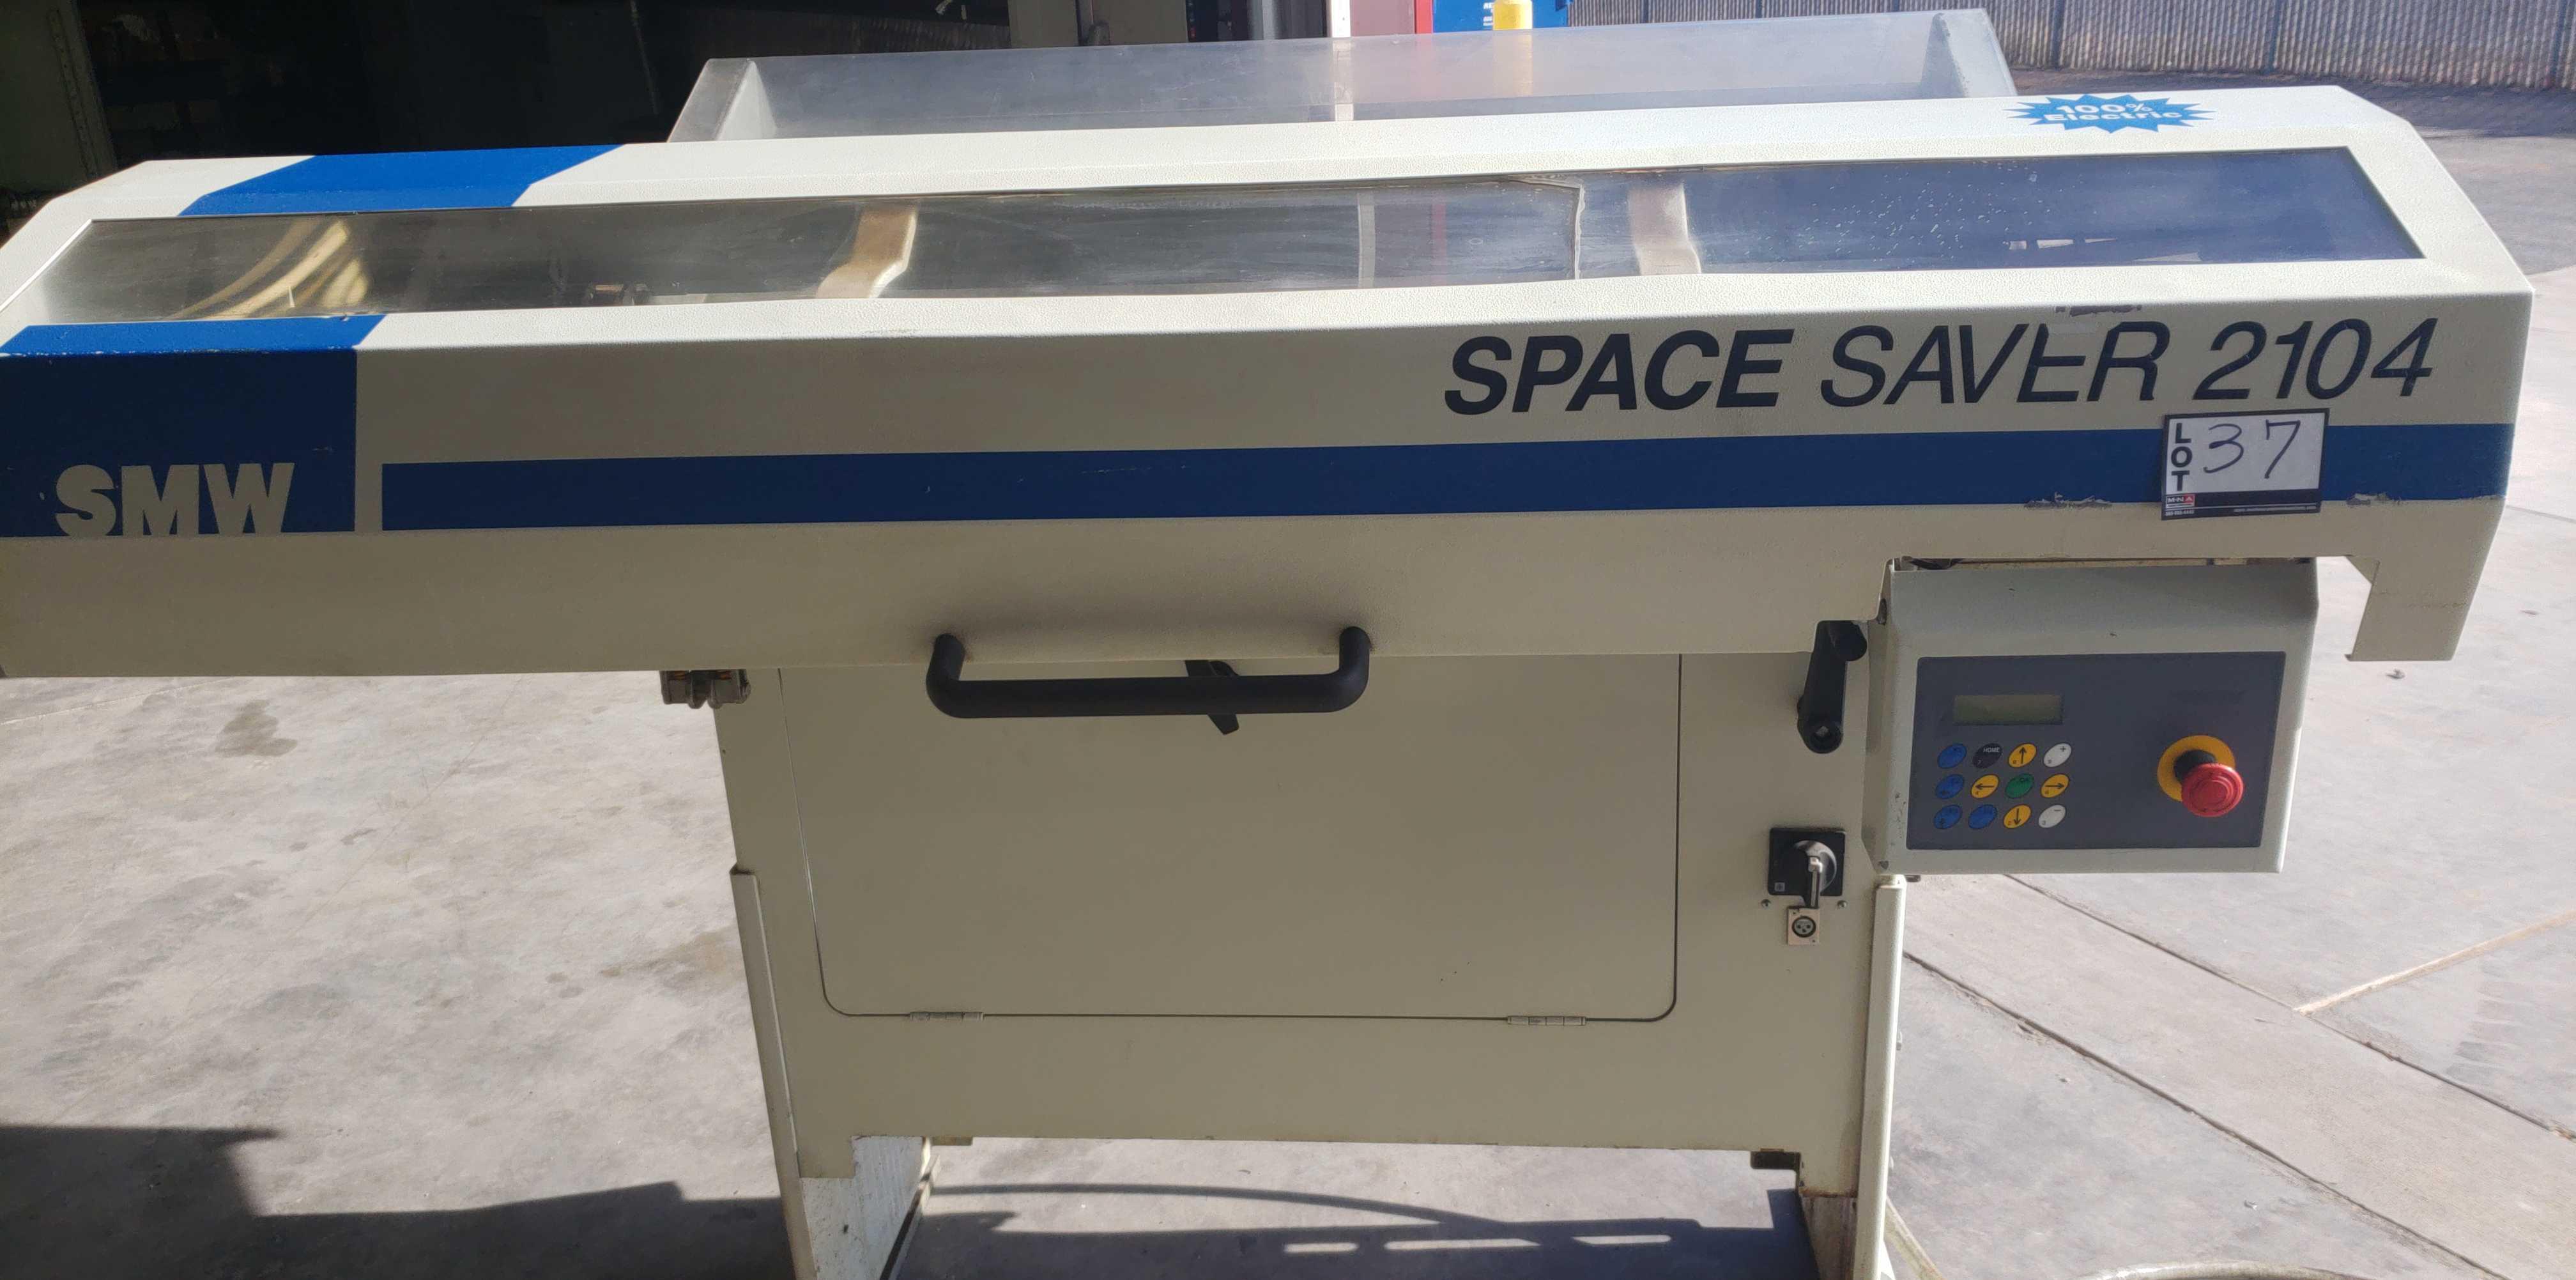 SMW Space Saver 2014 bar-feed